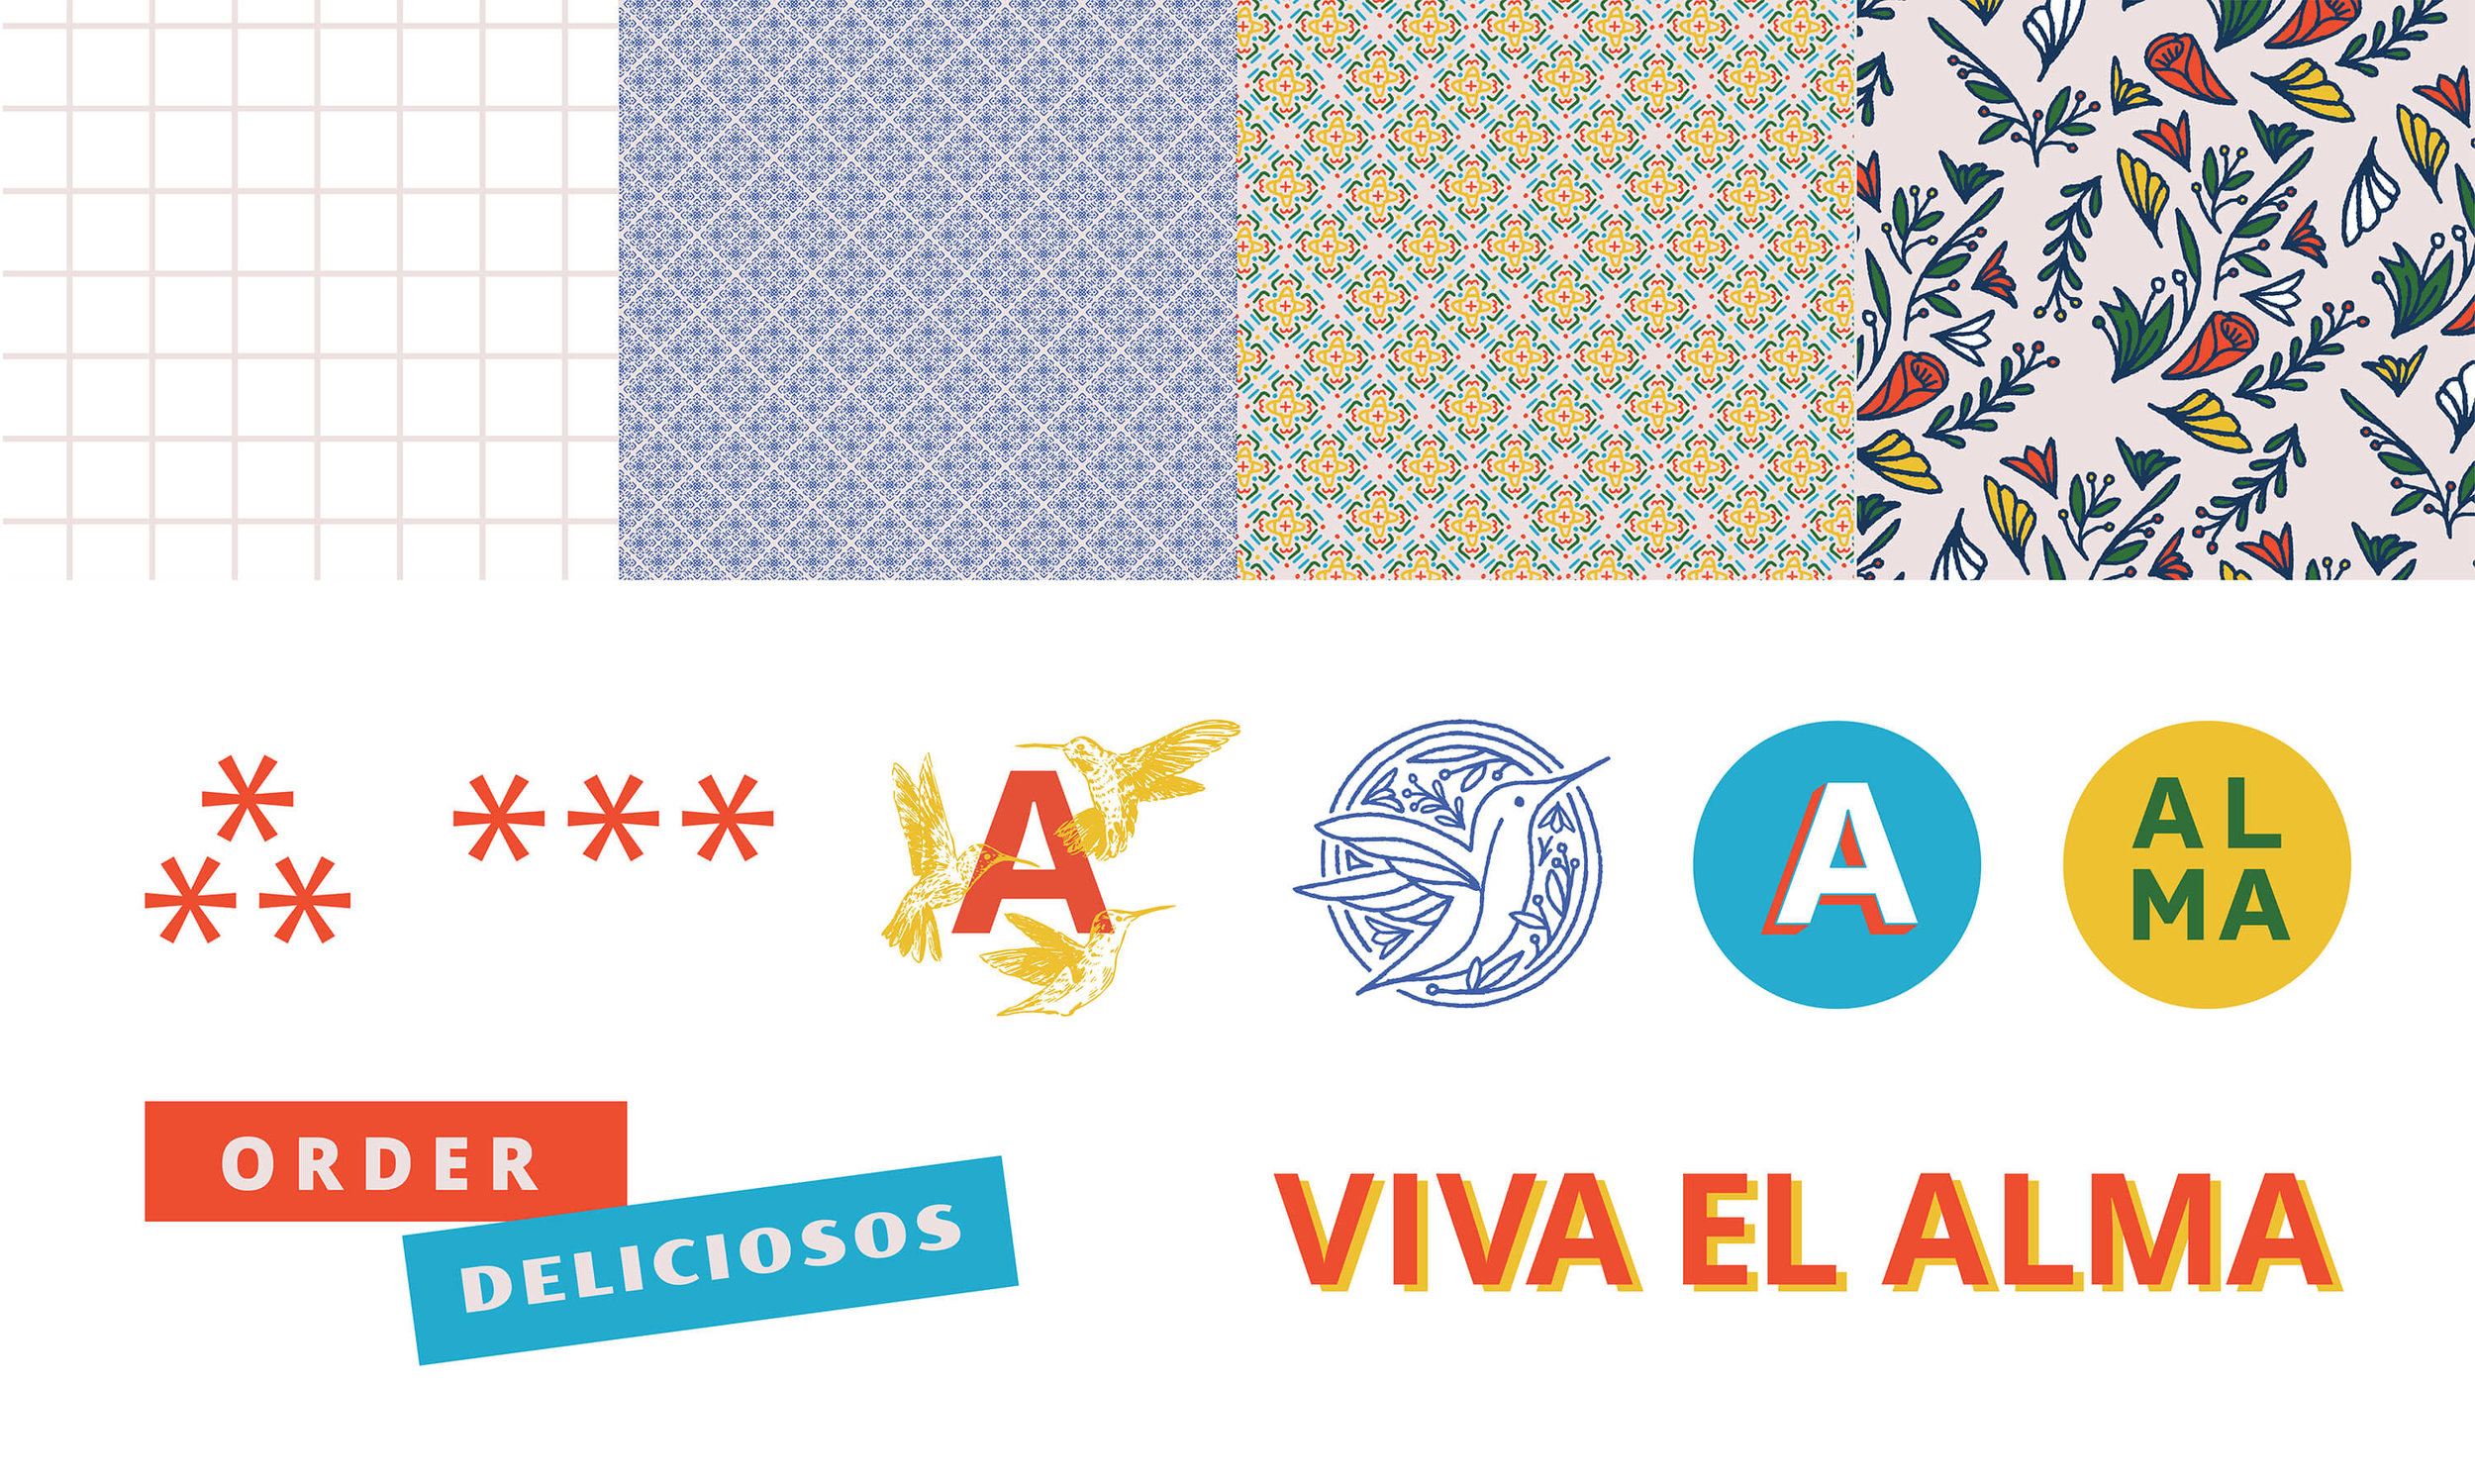 Remo-Remo-Design-ALMA-CS-Branding-03.jpg